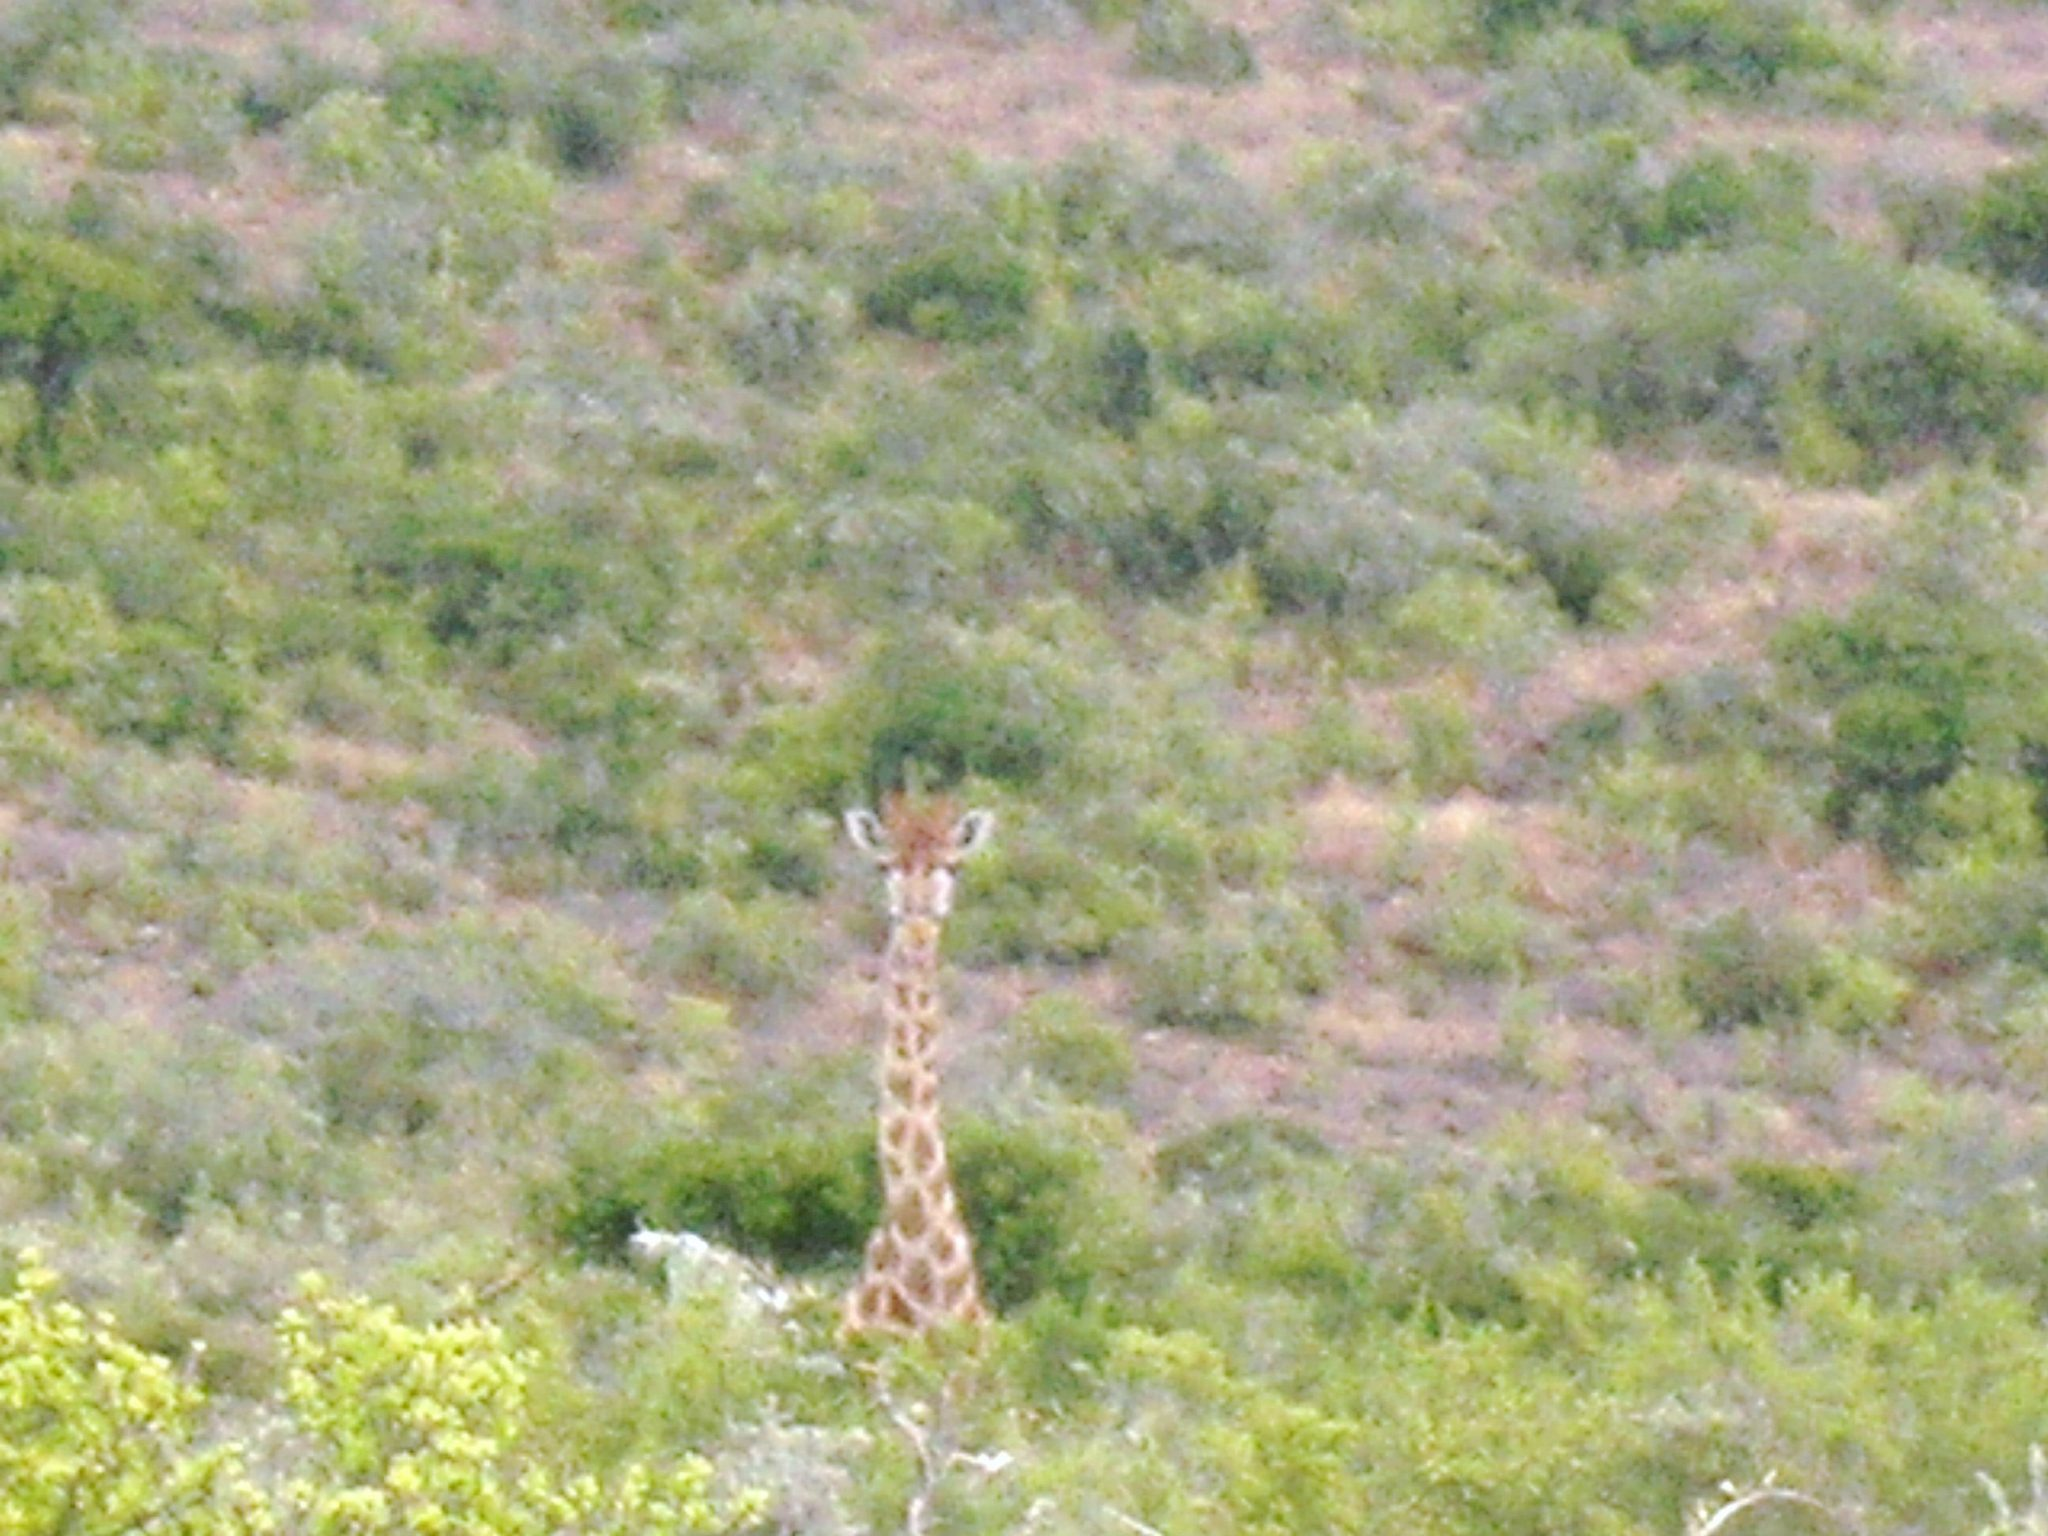 June_2007_Safari_Giraffe_dark